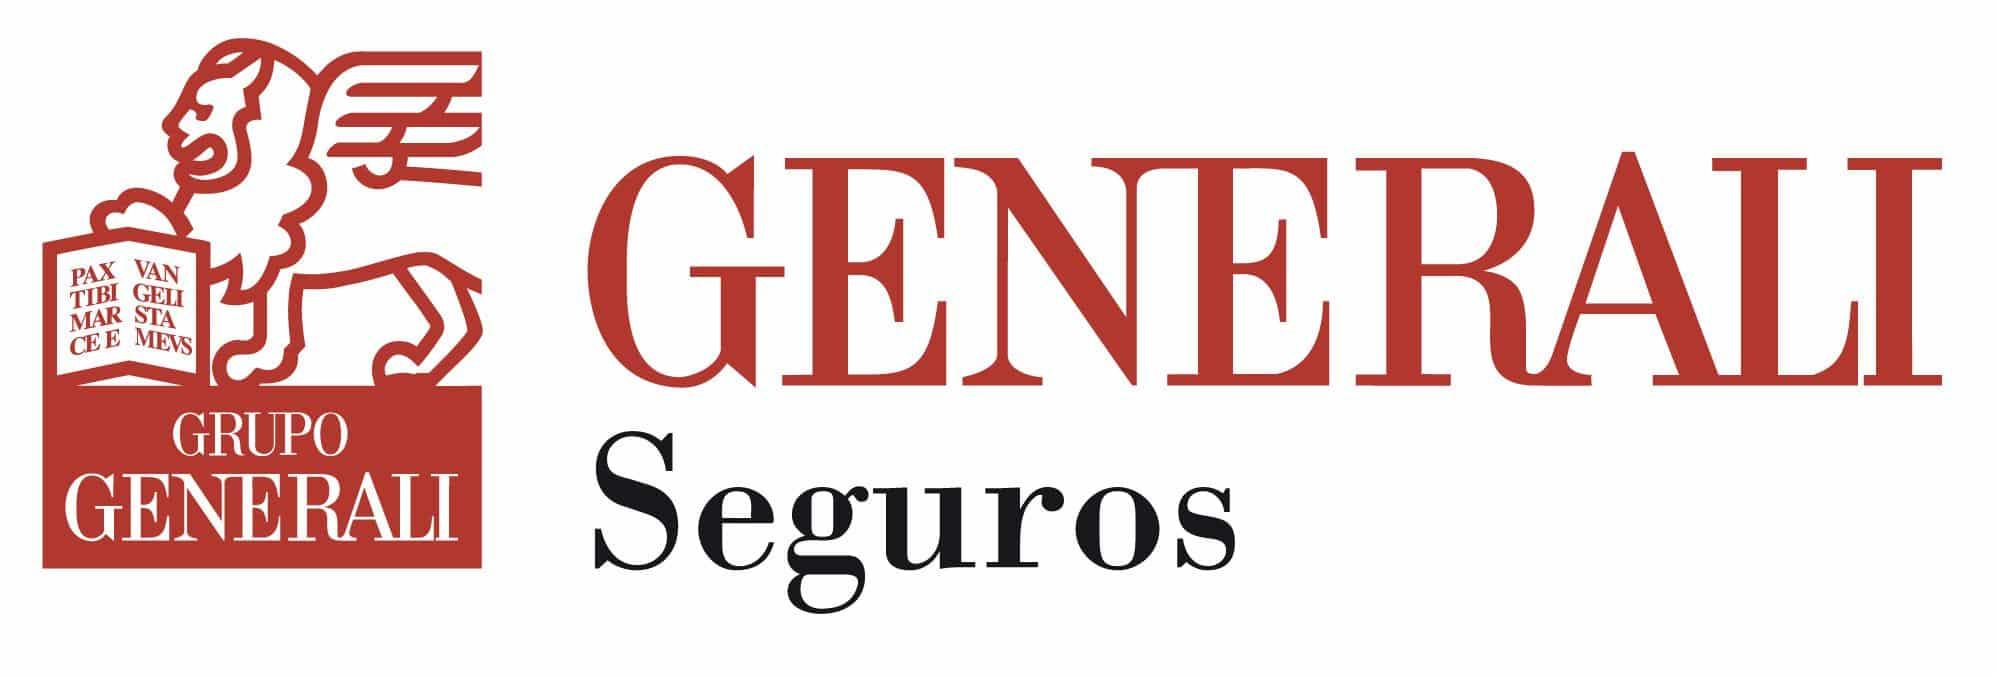 Oftalmologo GENERALI SEGUROS oftalmología